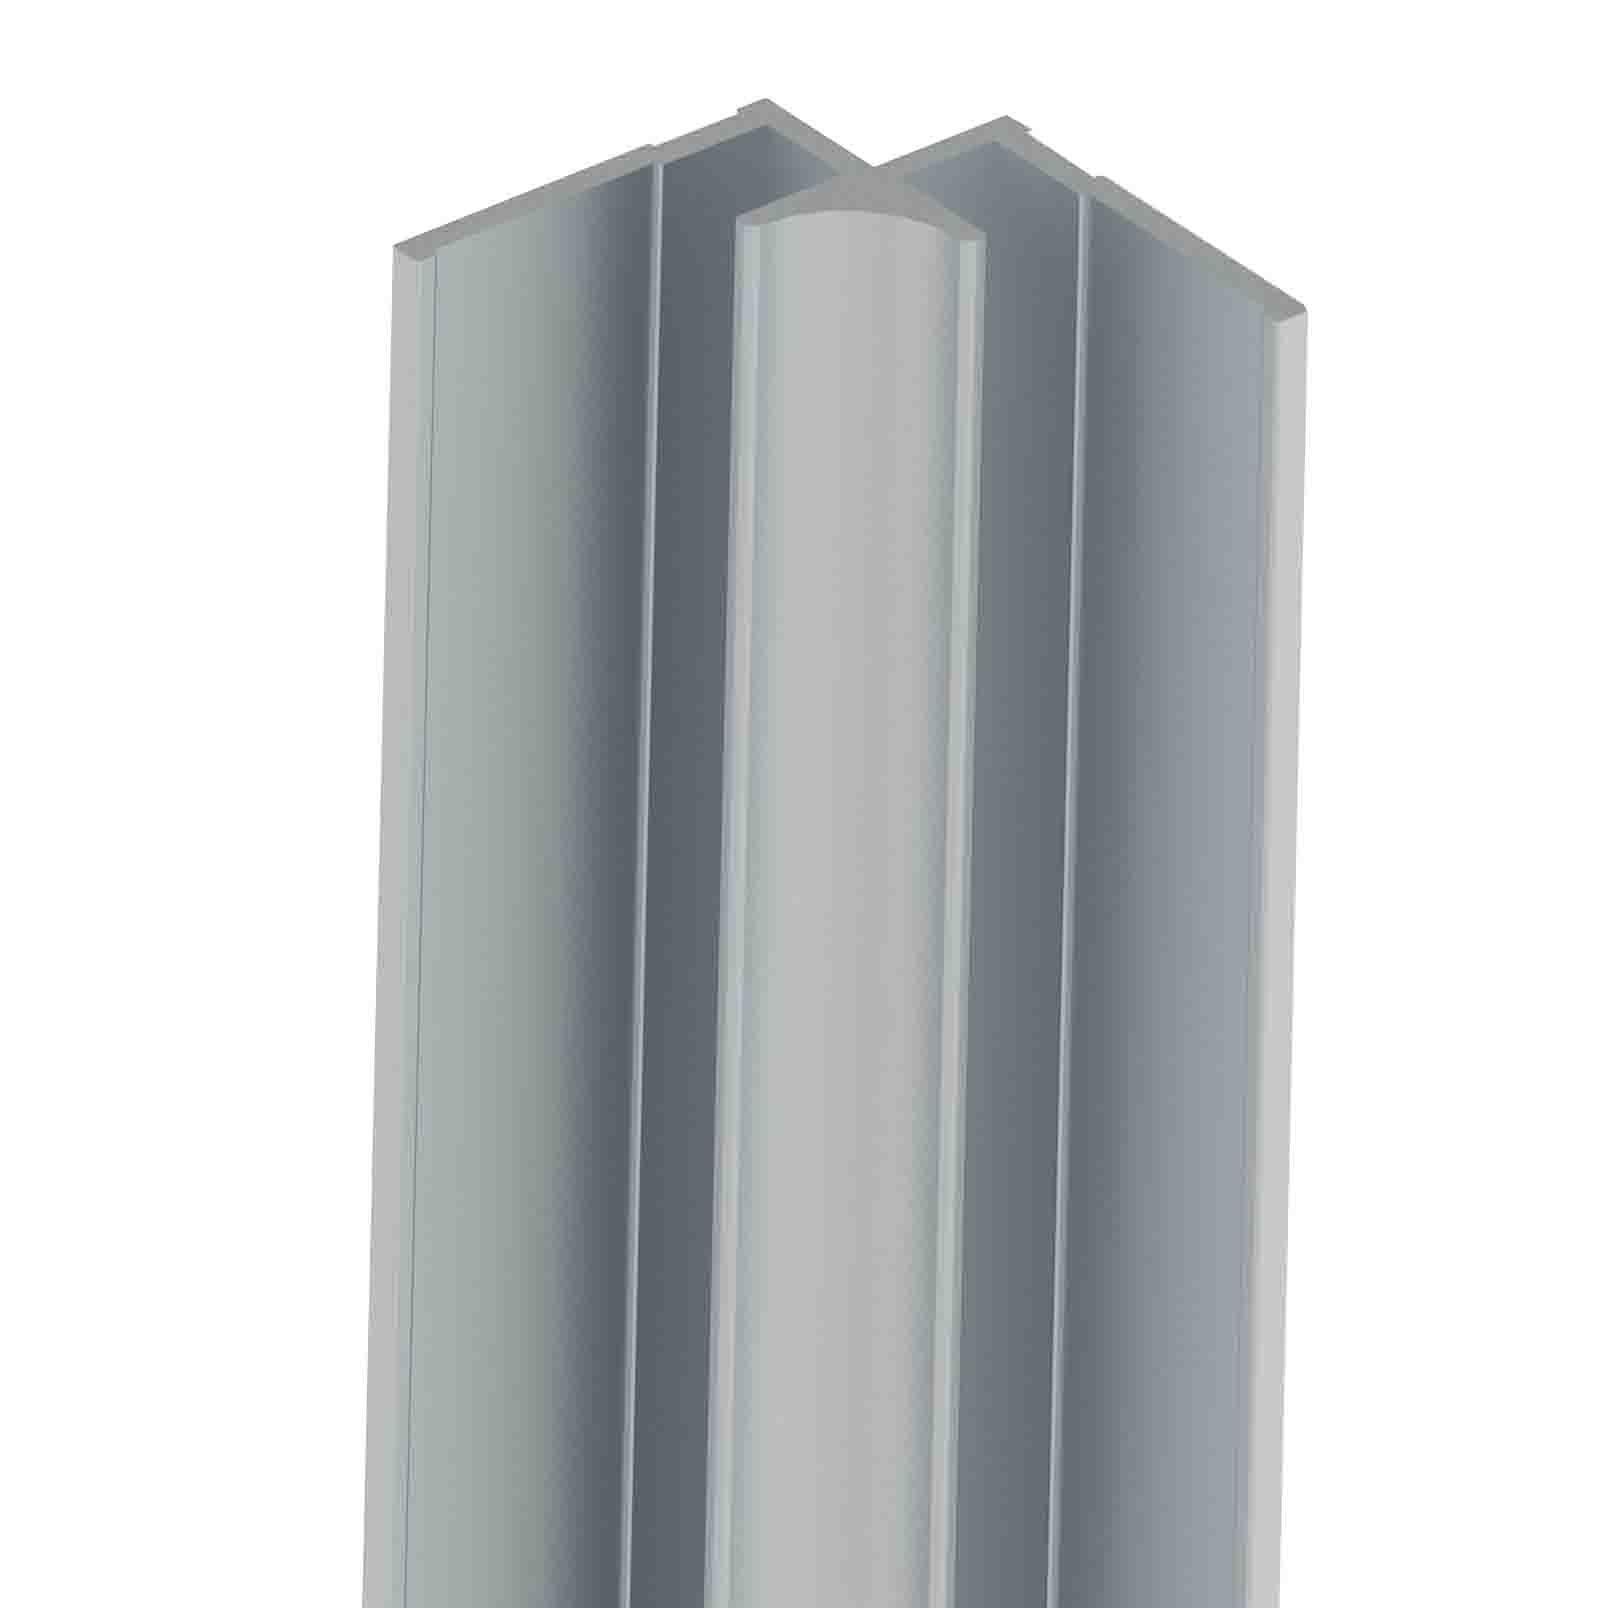 Vistelle Matt Aluminium Kitchen Splashback Internal Corner